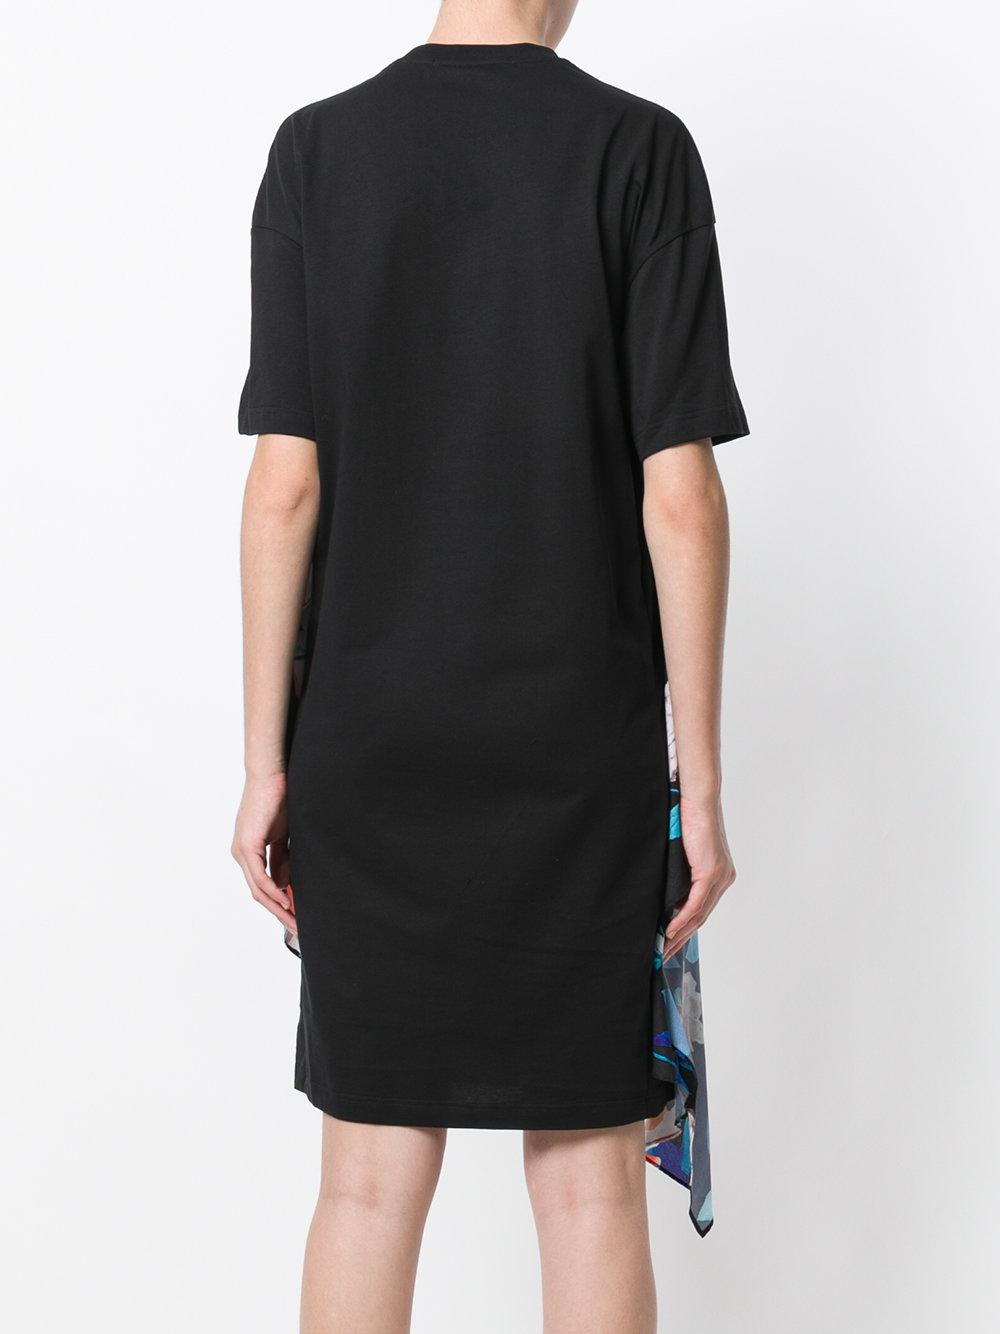 Lyst msgm floral detail logo t shirt dress in black for Logo t shirt dress